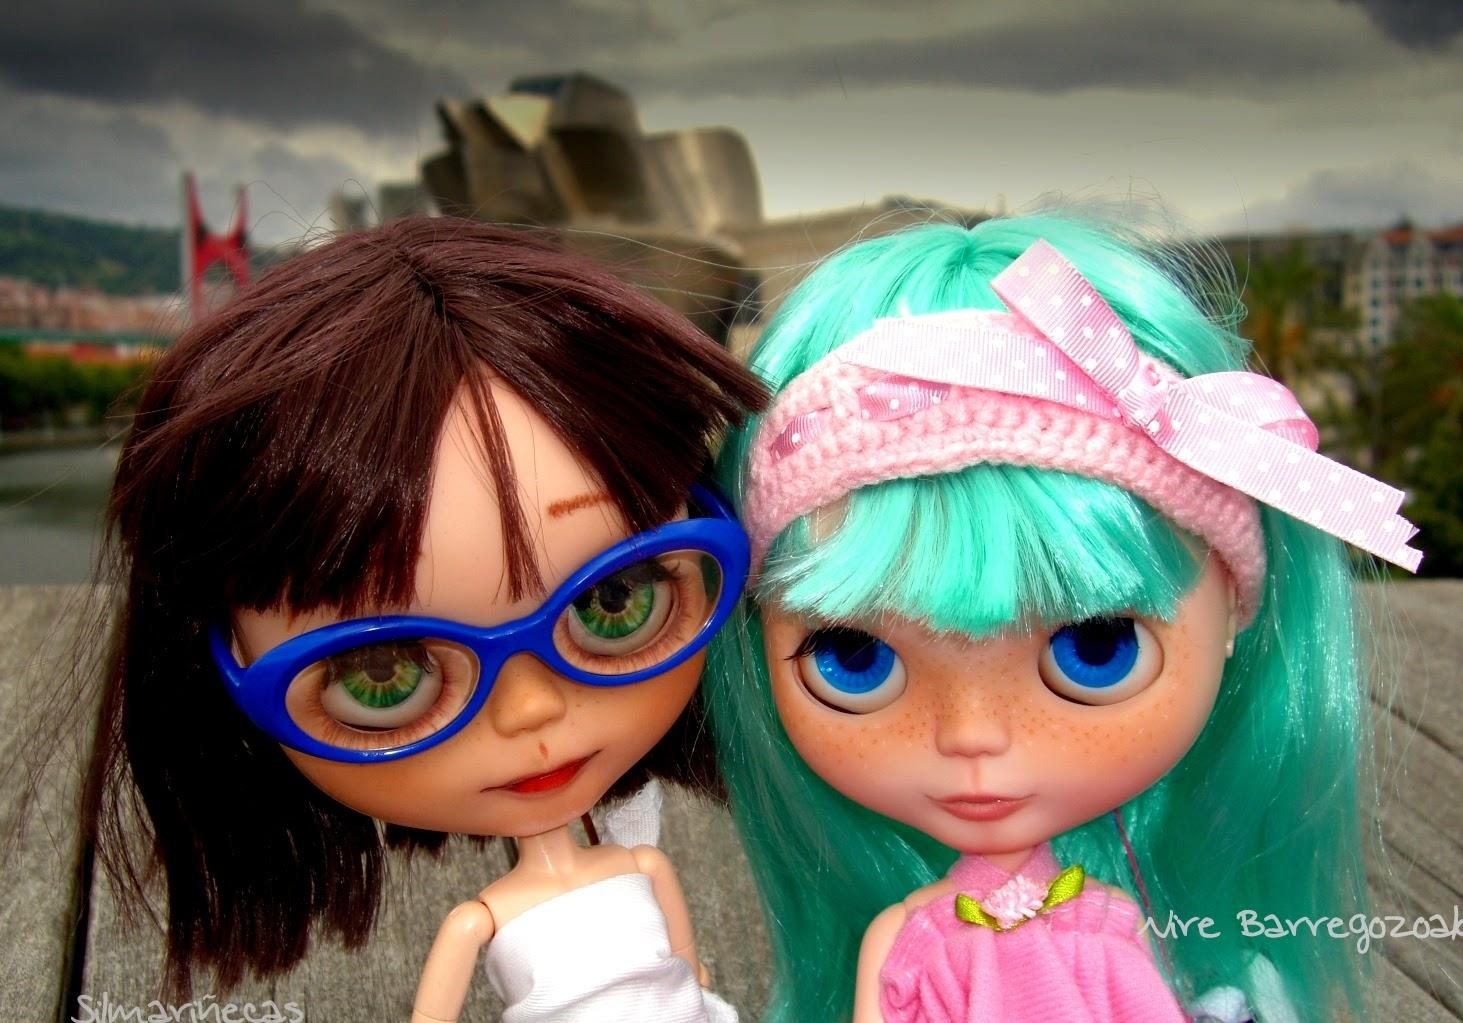 Basaak dolls y Guggenheim Bilbao